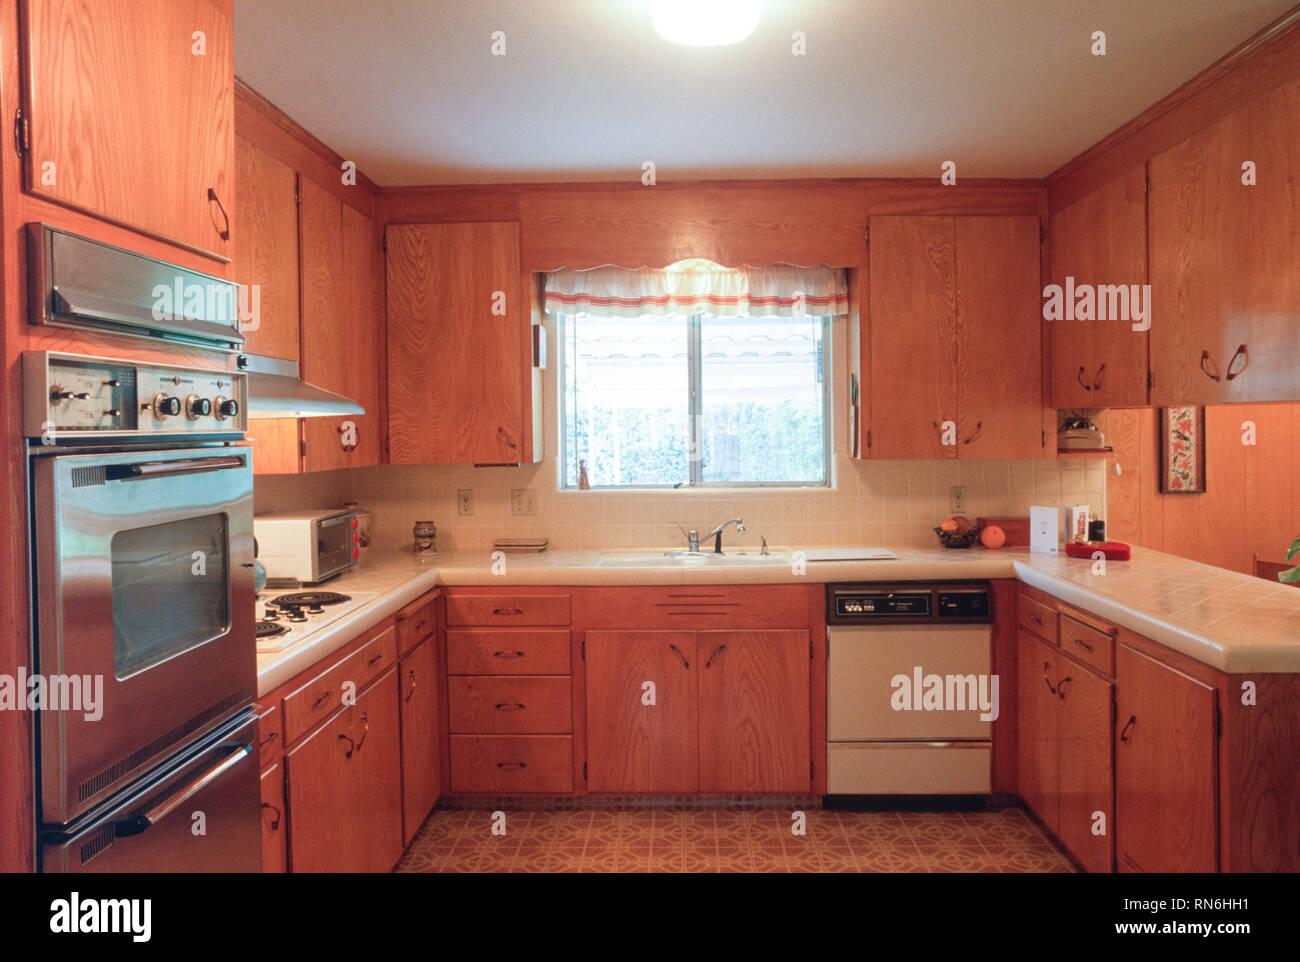 1960s Kitchen Handmade Wooden Cabinets Usa Stock Photo Alamy